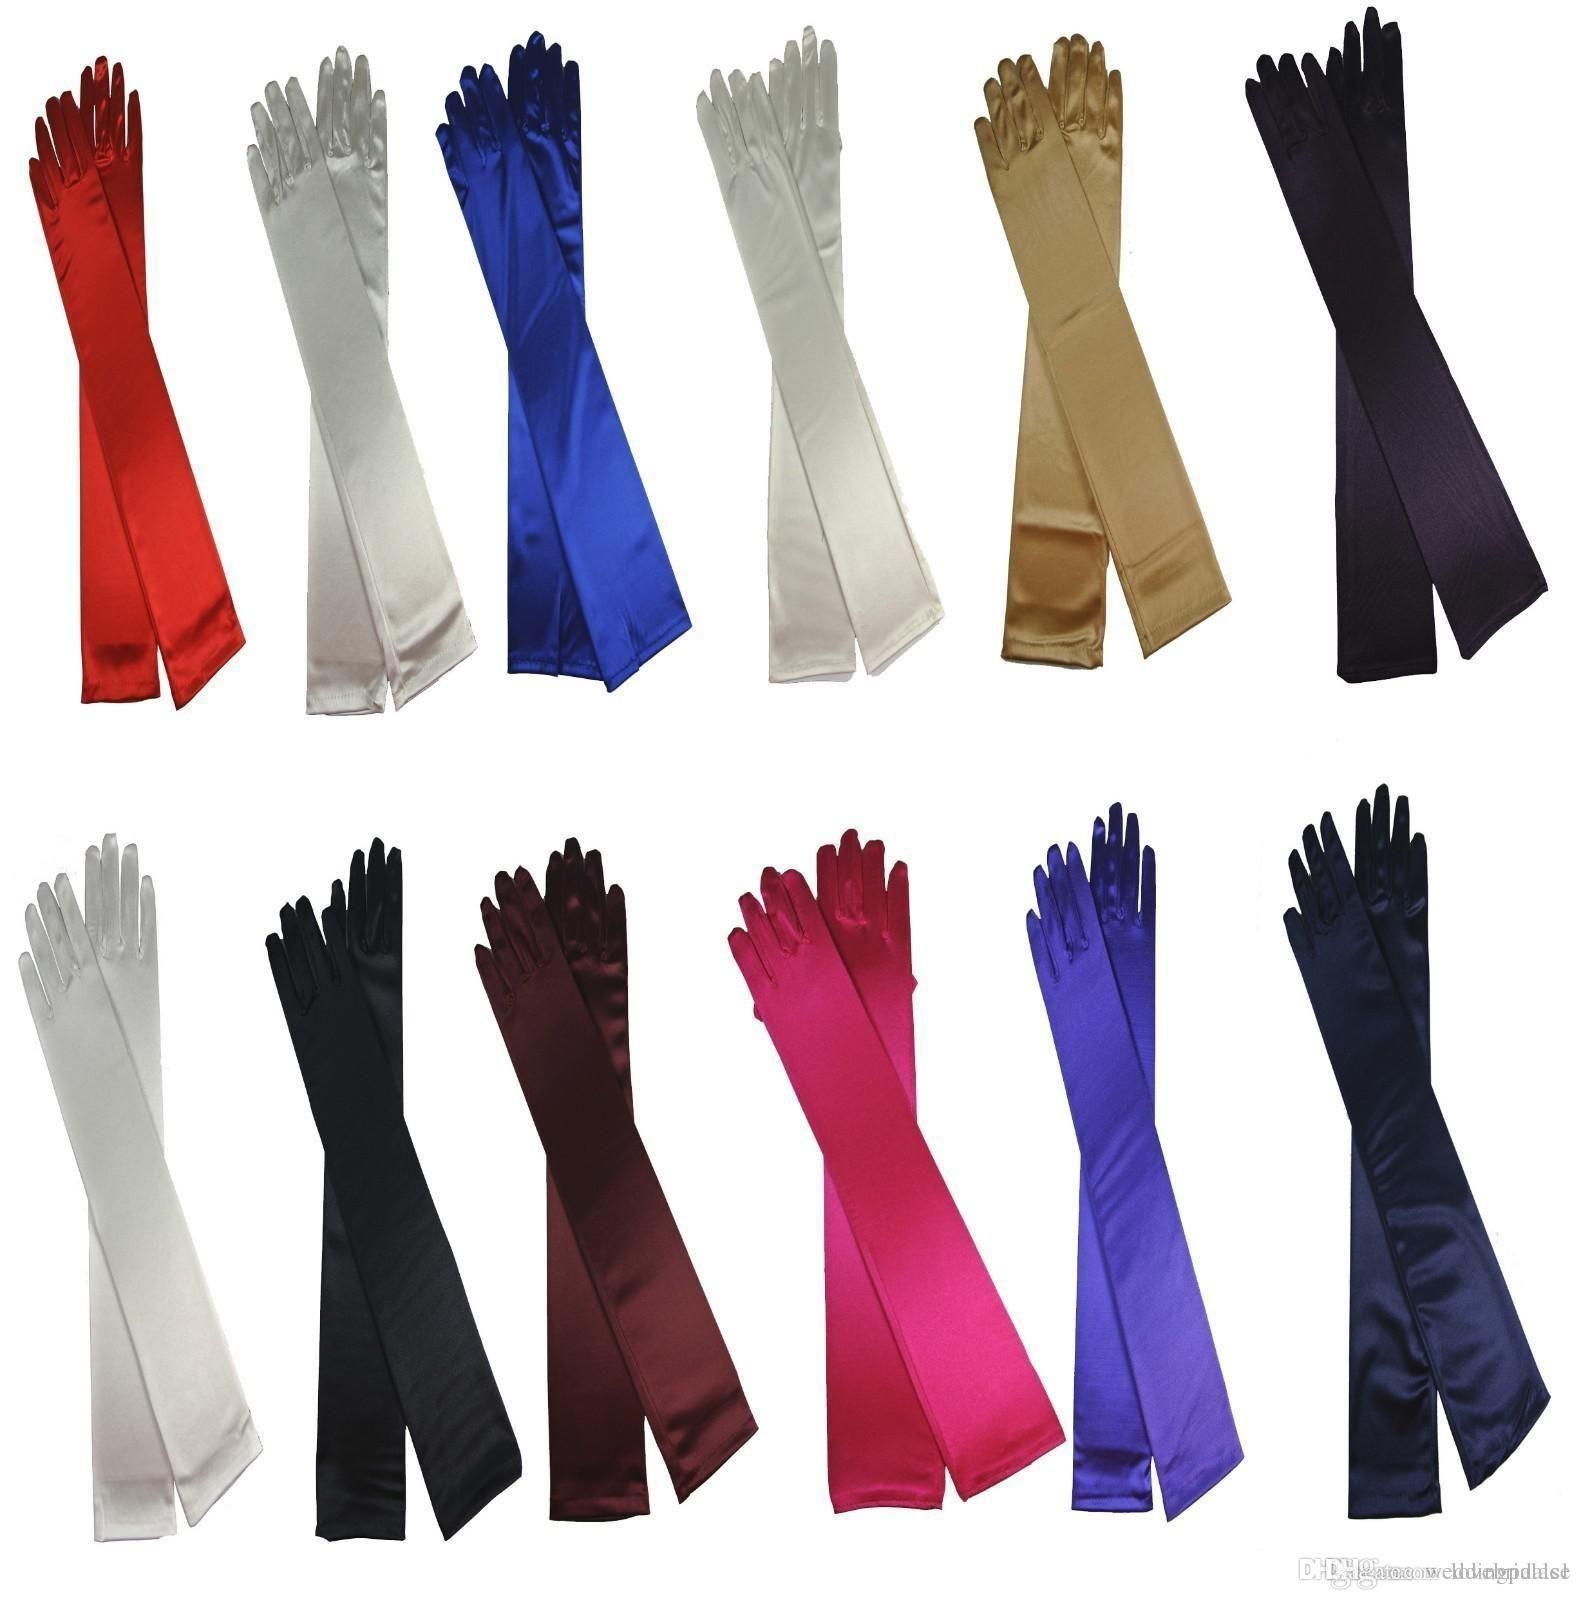 Dress Up Formal Wrist Length Dress Gloves White Church Black /& 7 Colors